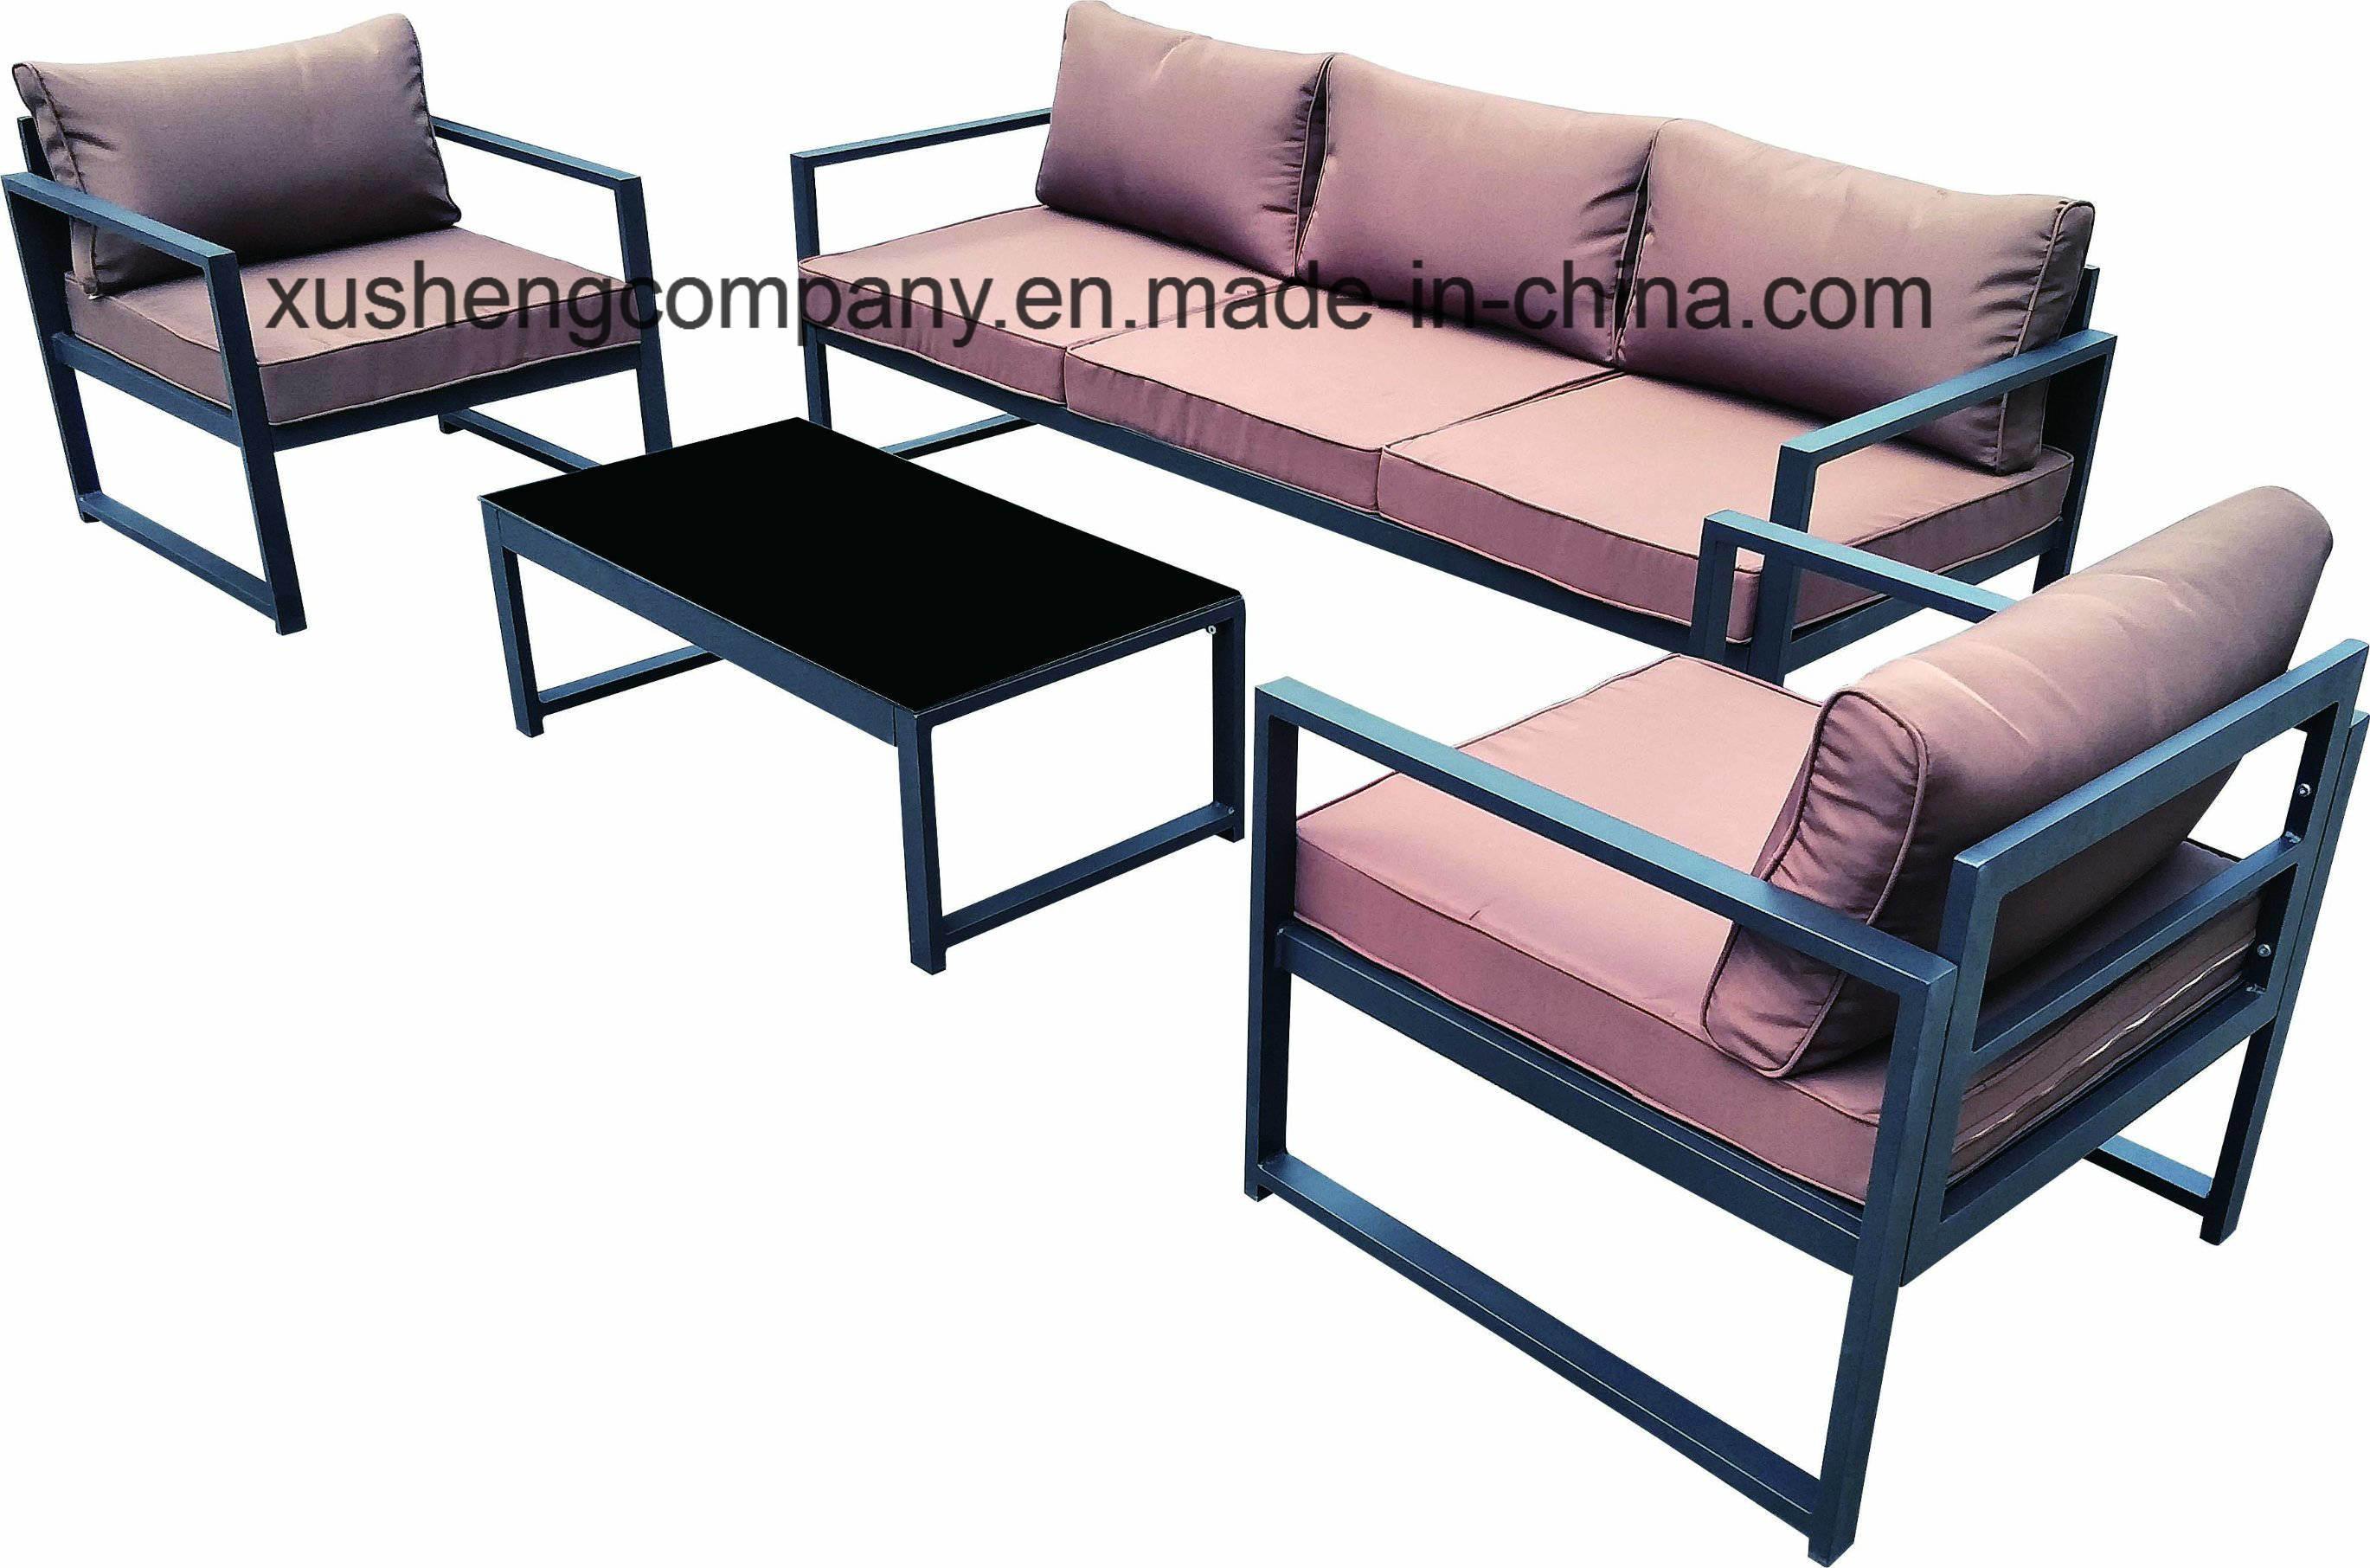 [Hot Item] Modern Design Steel Metal Leisure Waiting Office Home Outdoor  Sofa